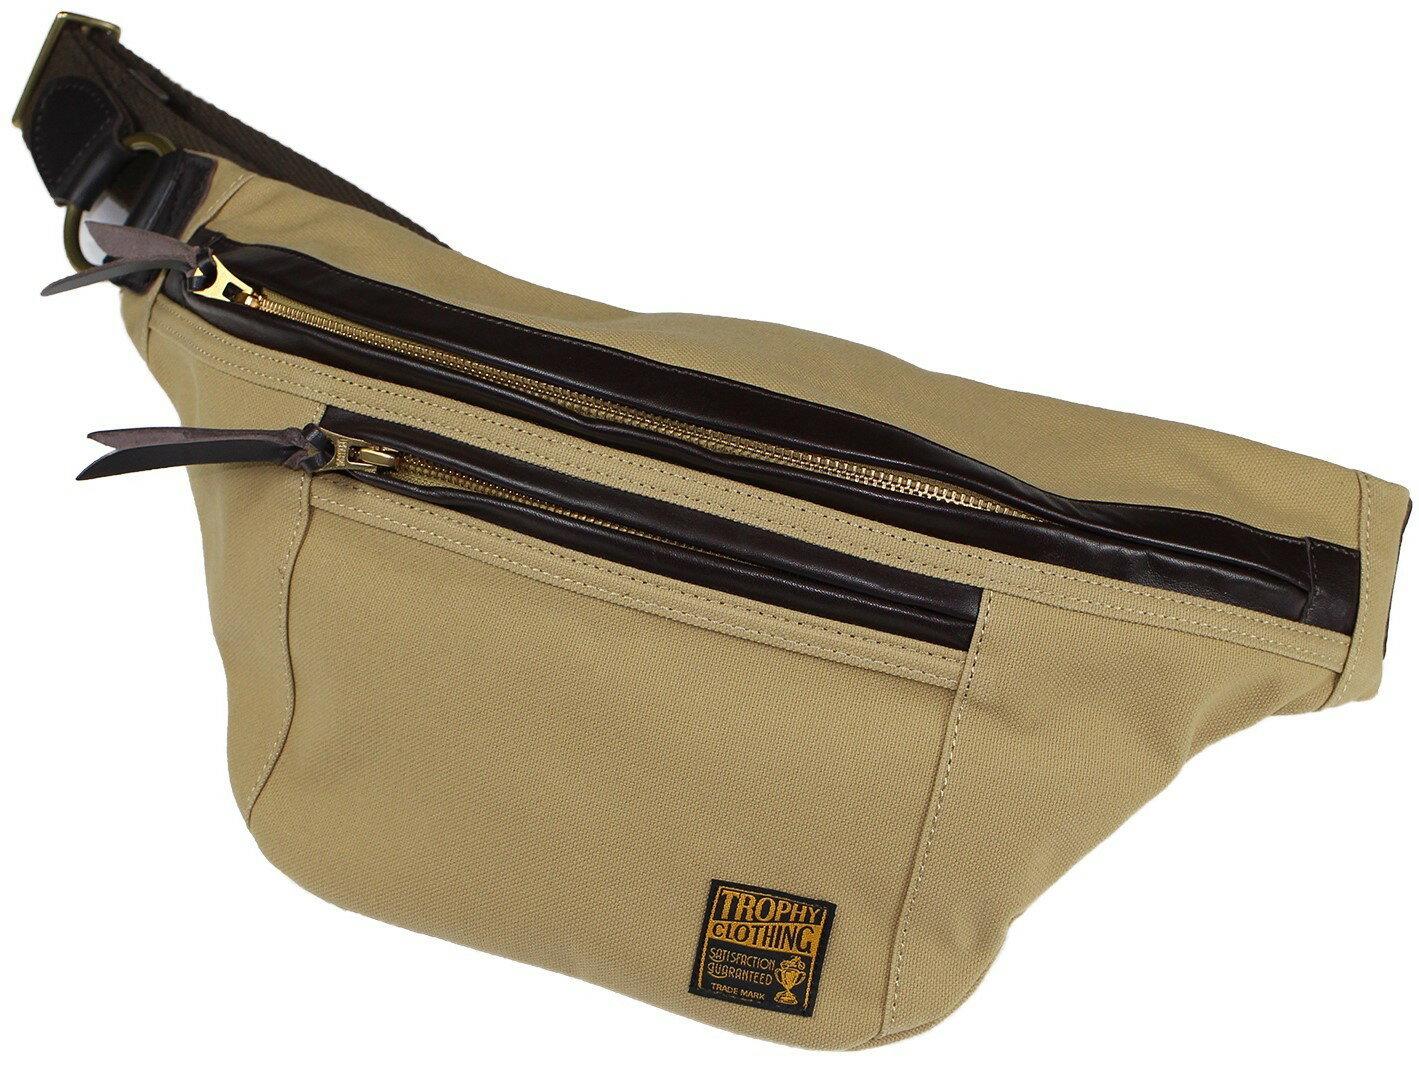 TROPHY CLOTHING [-Day Trip Bag- Beige]